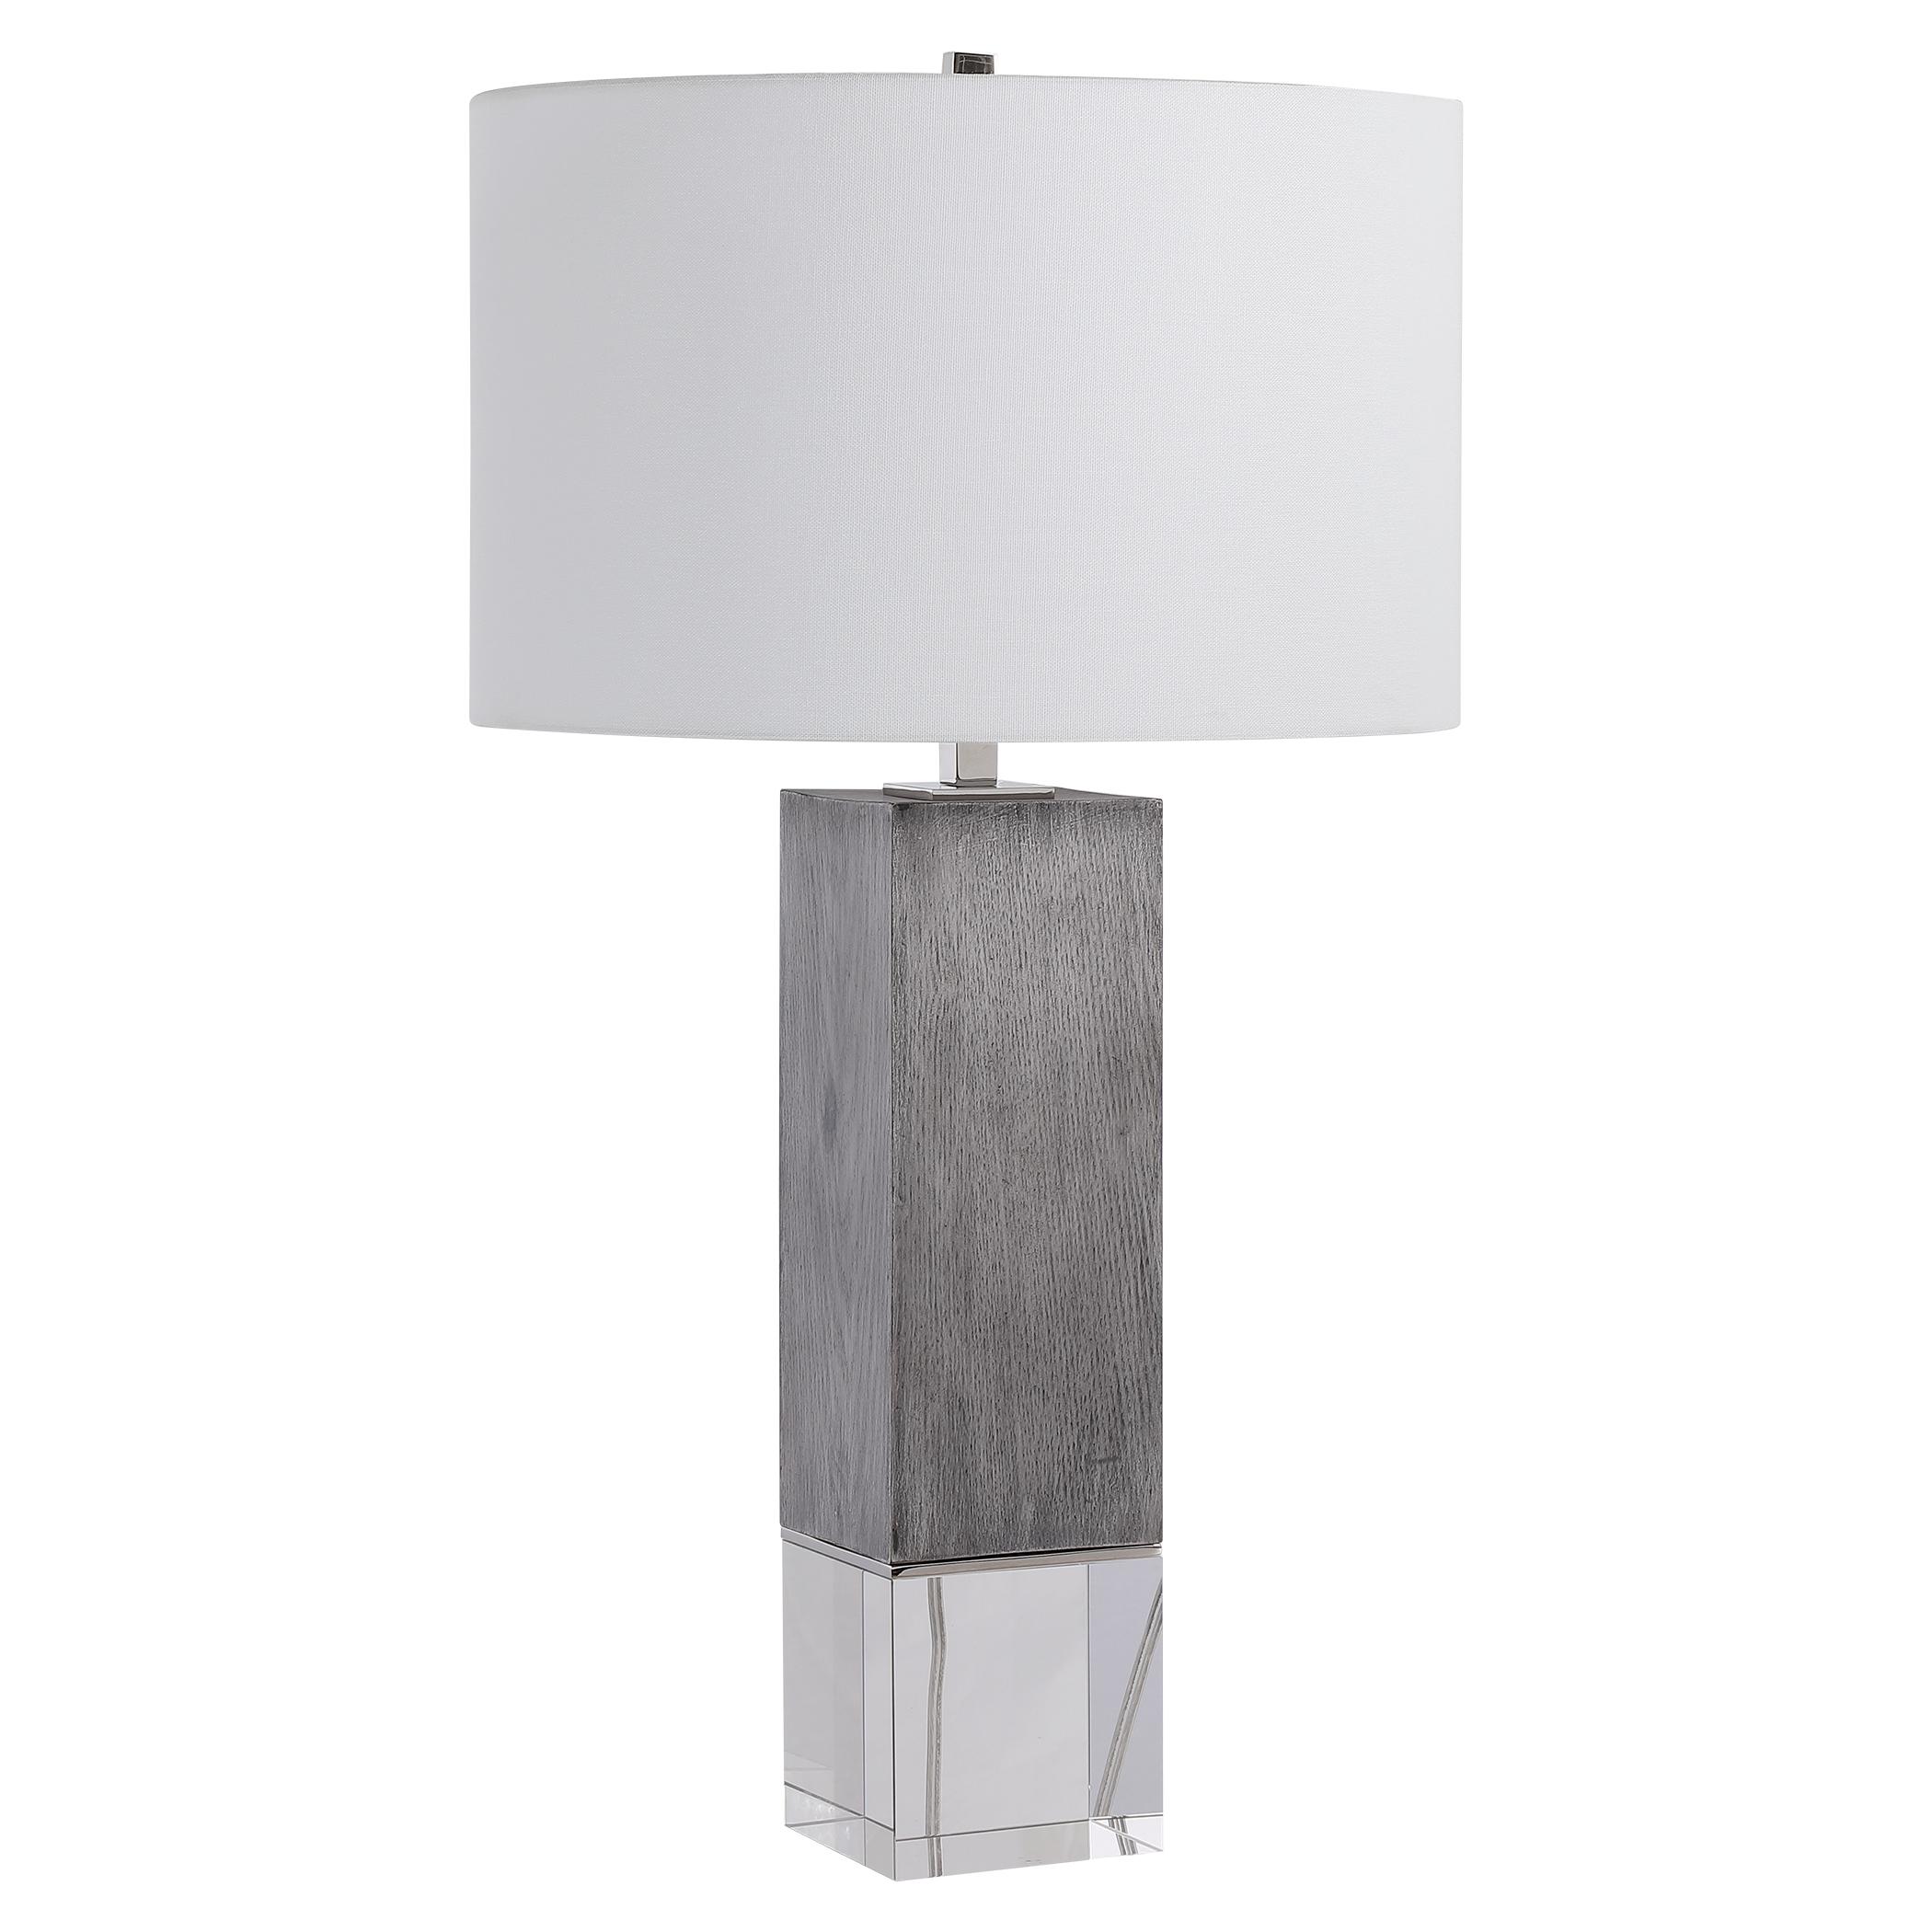 Cordata Modern Lodge Table Lamp